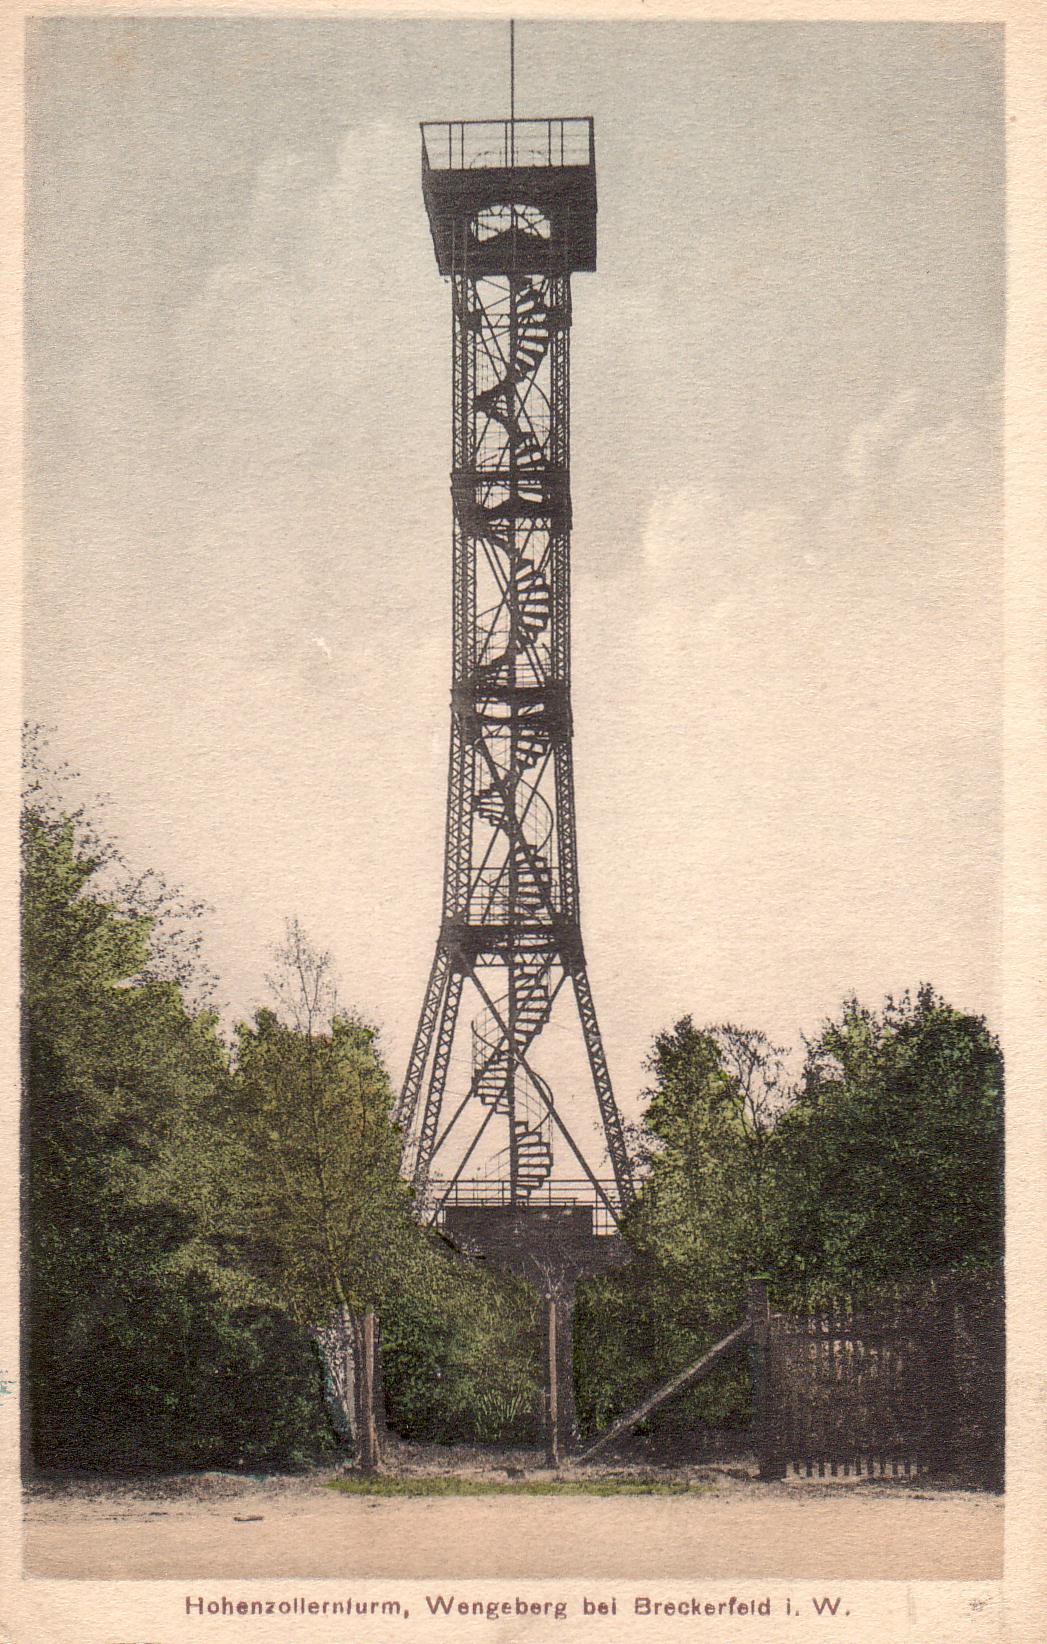 Hohenzollernturm